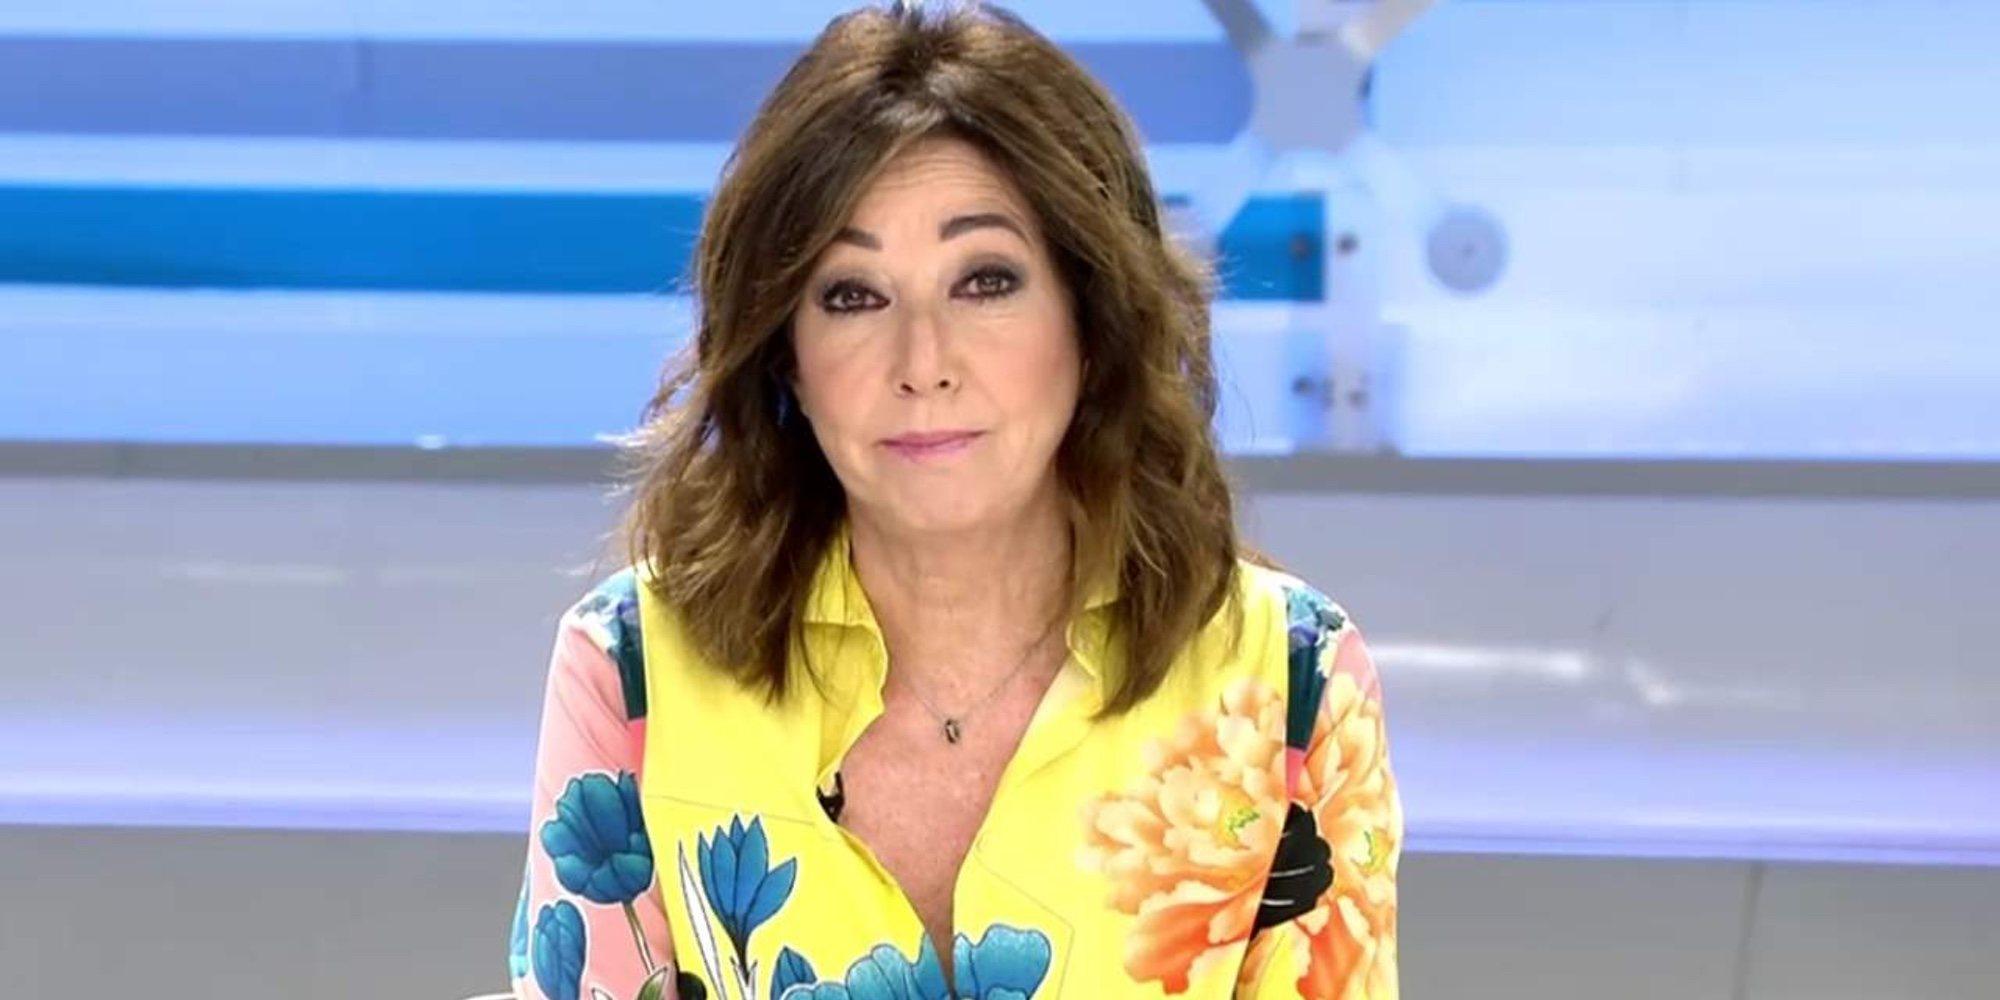 Ana Rosa Quintana envía todo su ánimo a Julia Otero tras anunciar que tiene cáncer